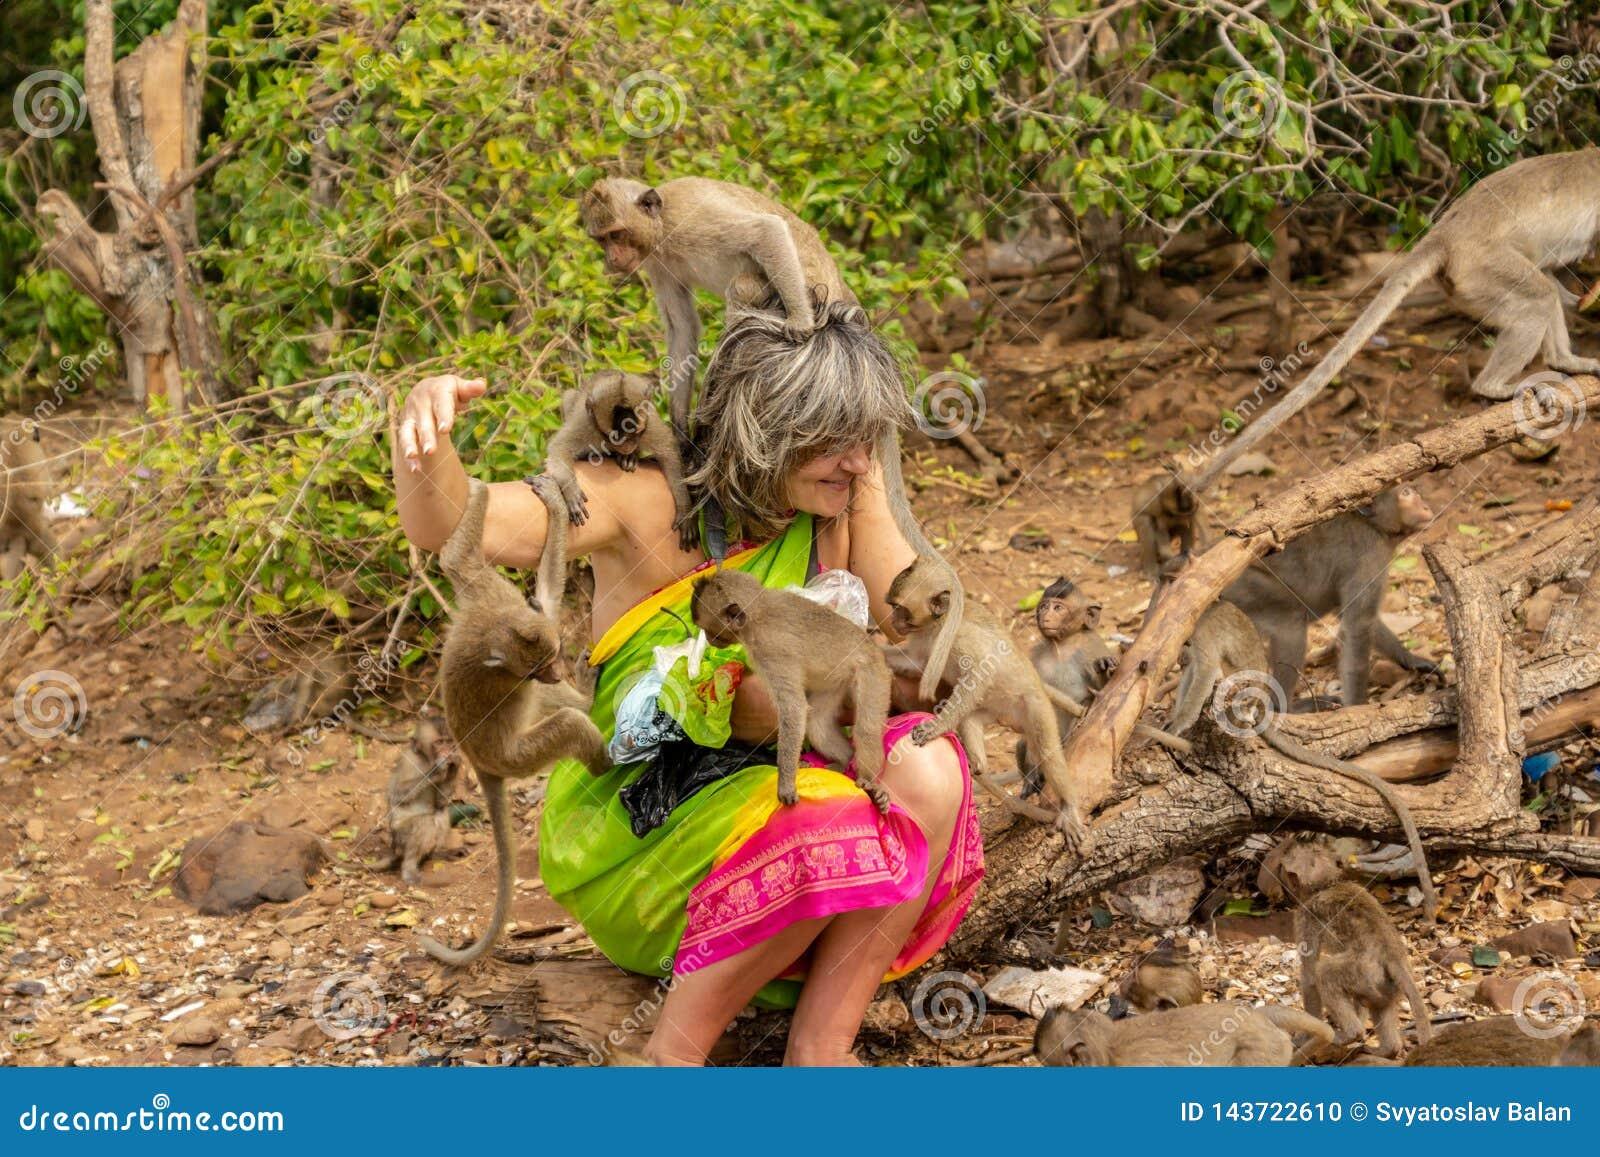 Pattaya, Ταϊλάνδη - 1 Ιανουαρίου 2014: Νησί πιθήκων κοντά σε Pattaya